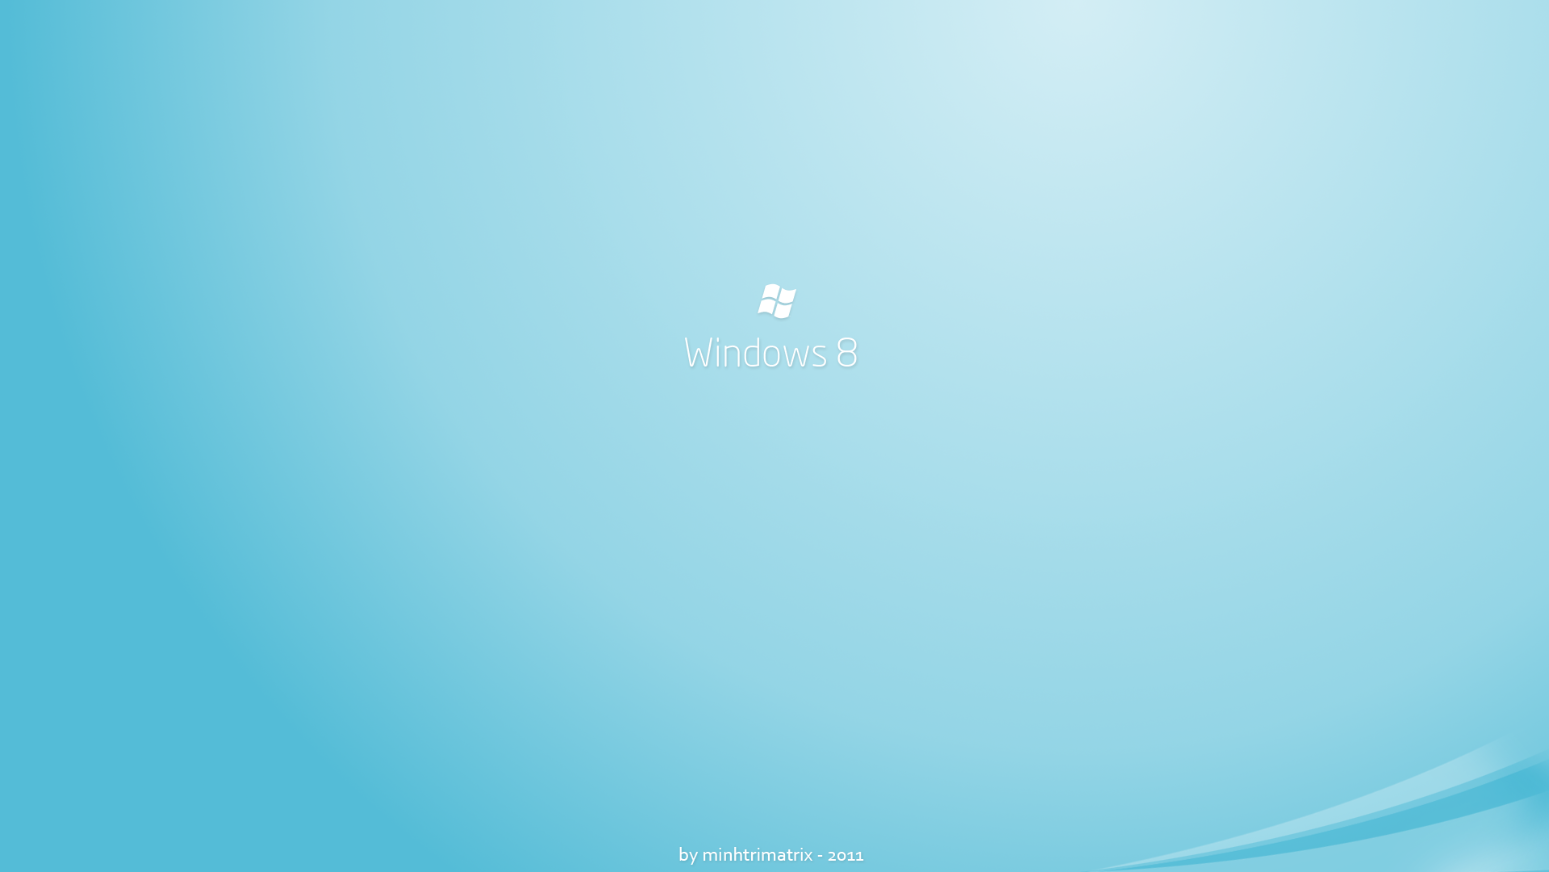 Windows 8 Logon Screen